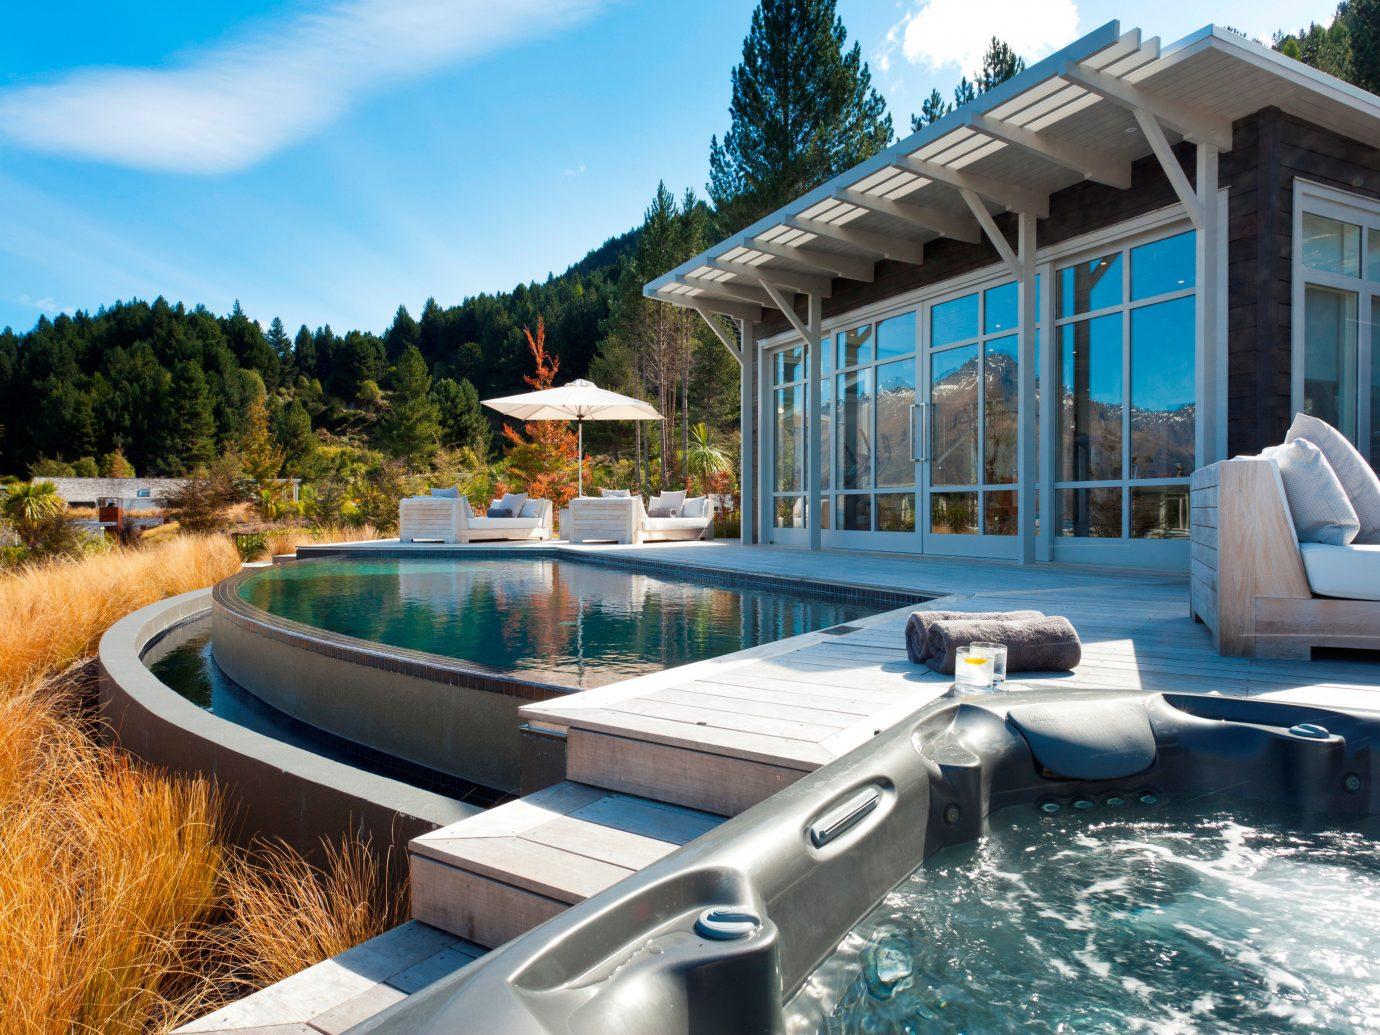 Trip Ideas outdoor sky swimming pool leisure property vacation estate vehicle Resort home Villa real estate backyard Deck